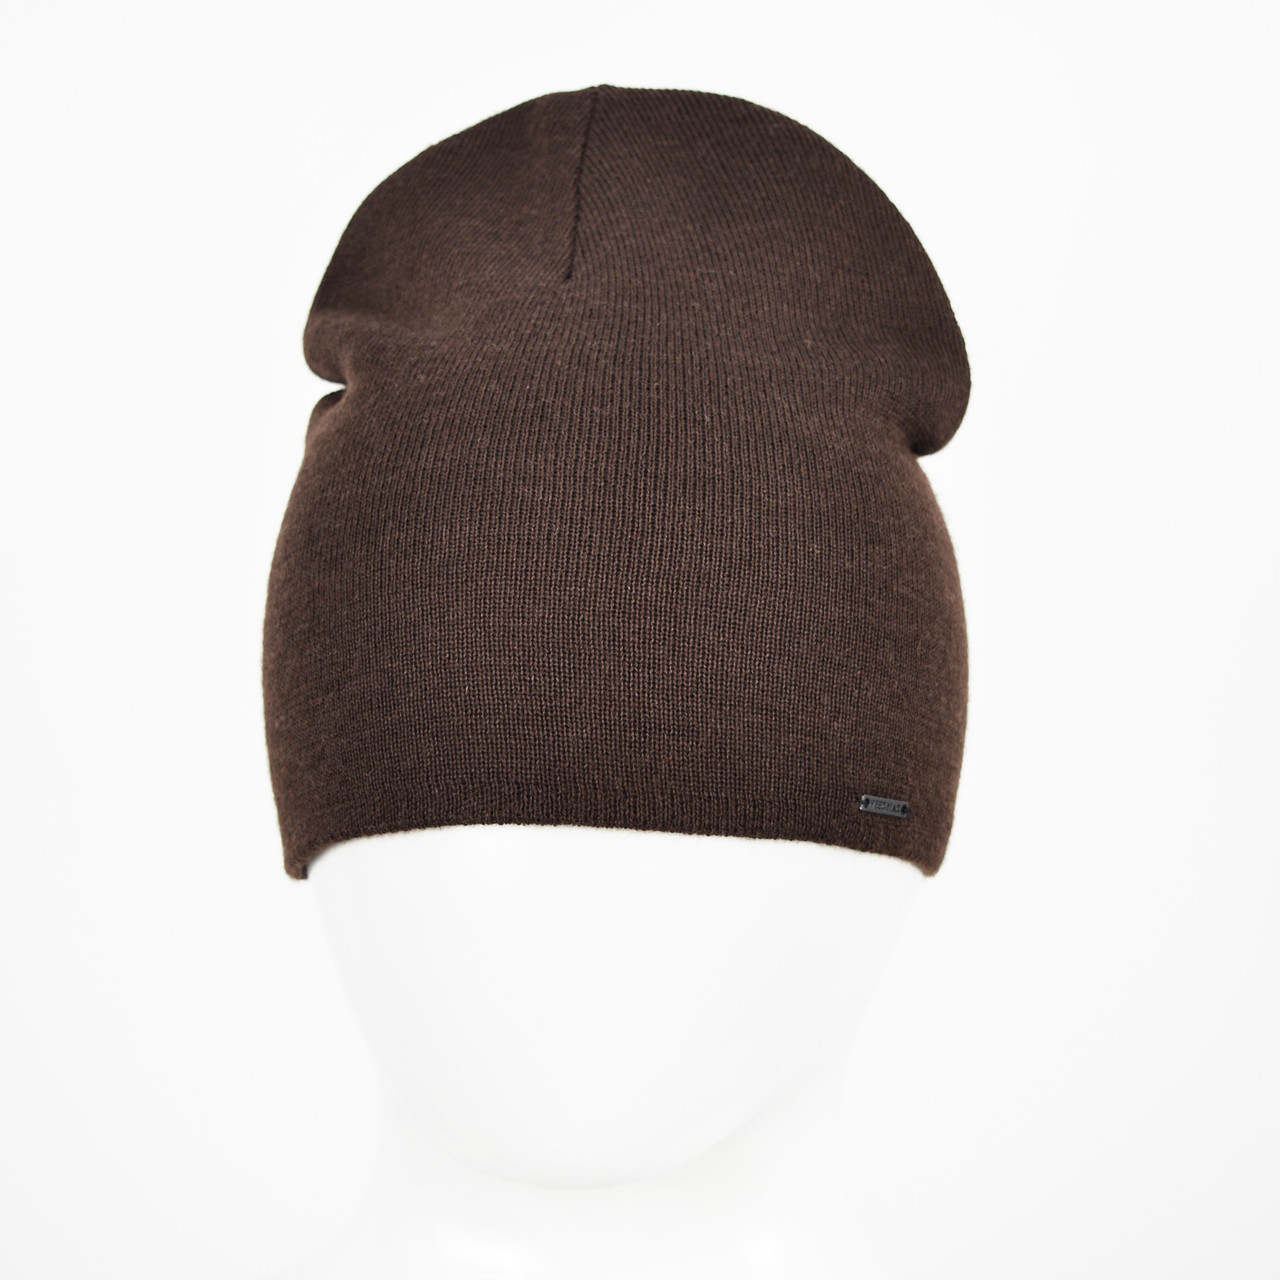 Мужская Шерстяная шапка Veer-Mar. SH465 коричневый